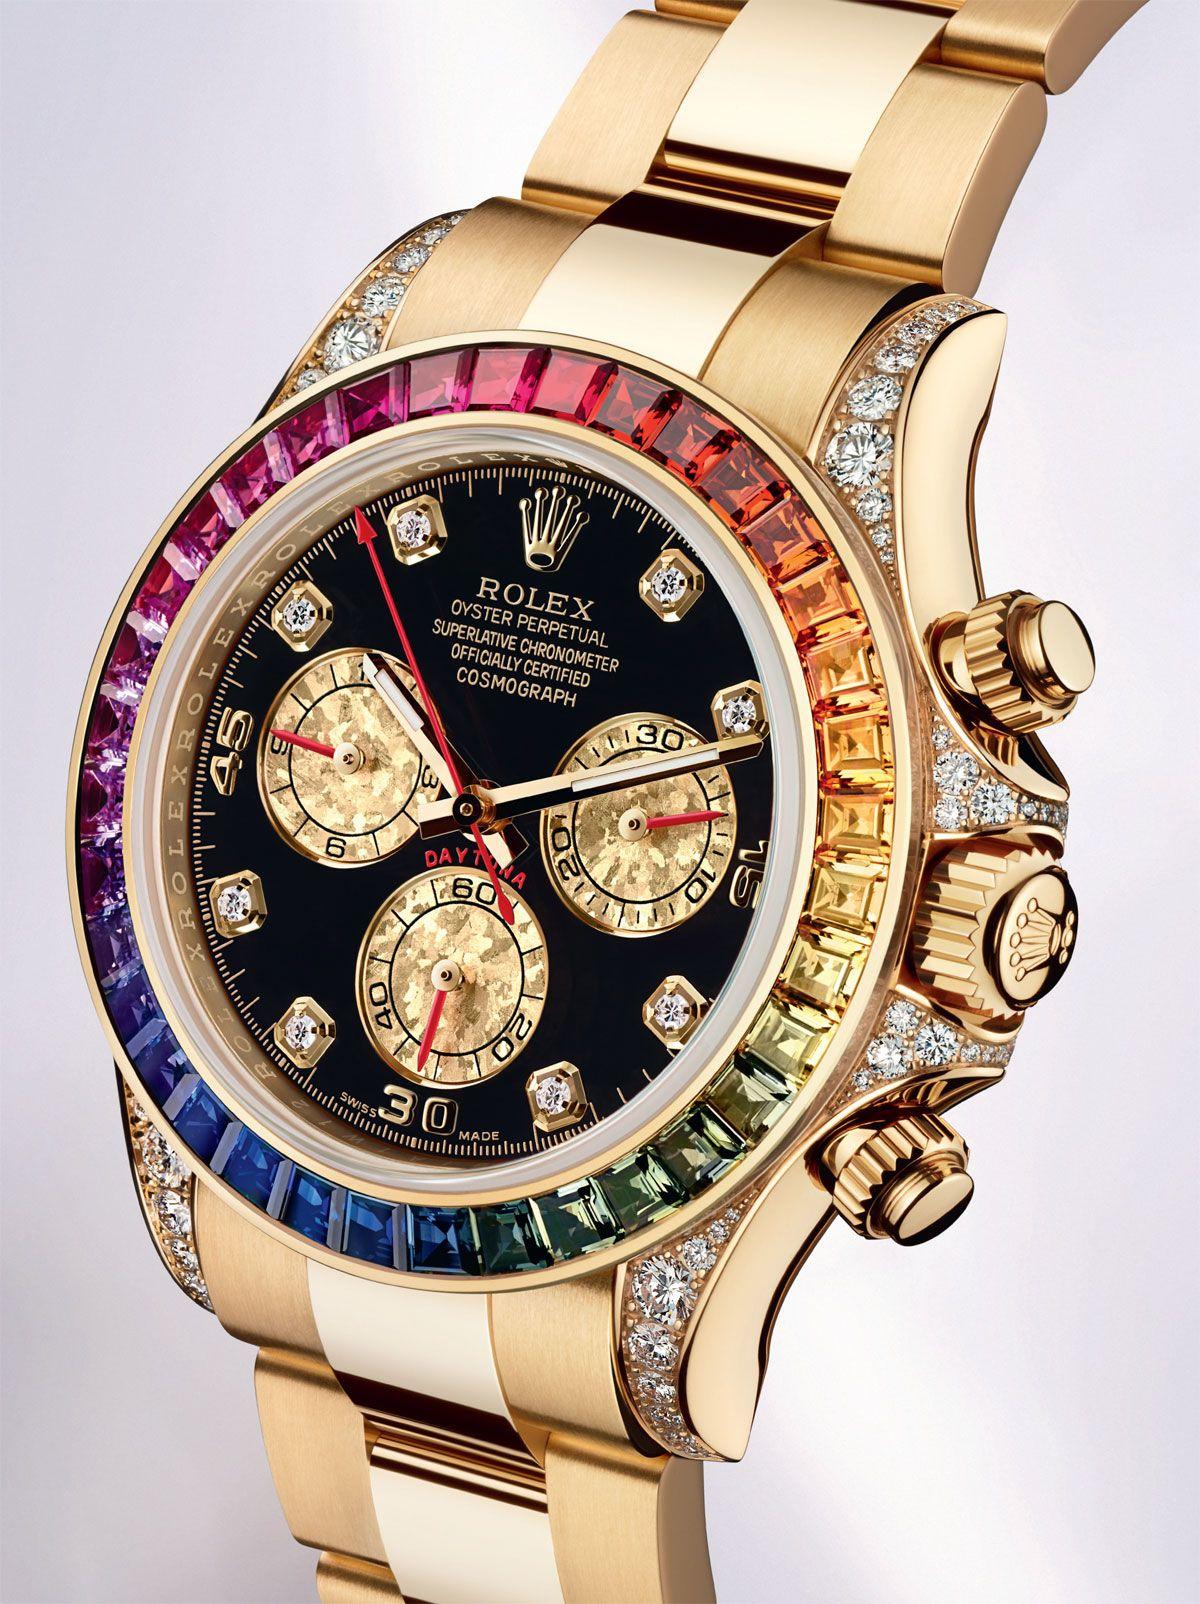 66fbc8ac9c2 Rolex Daytona Rainbow - Yellow or white gold bands